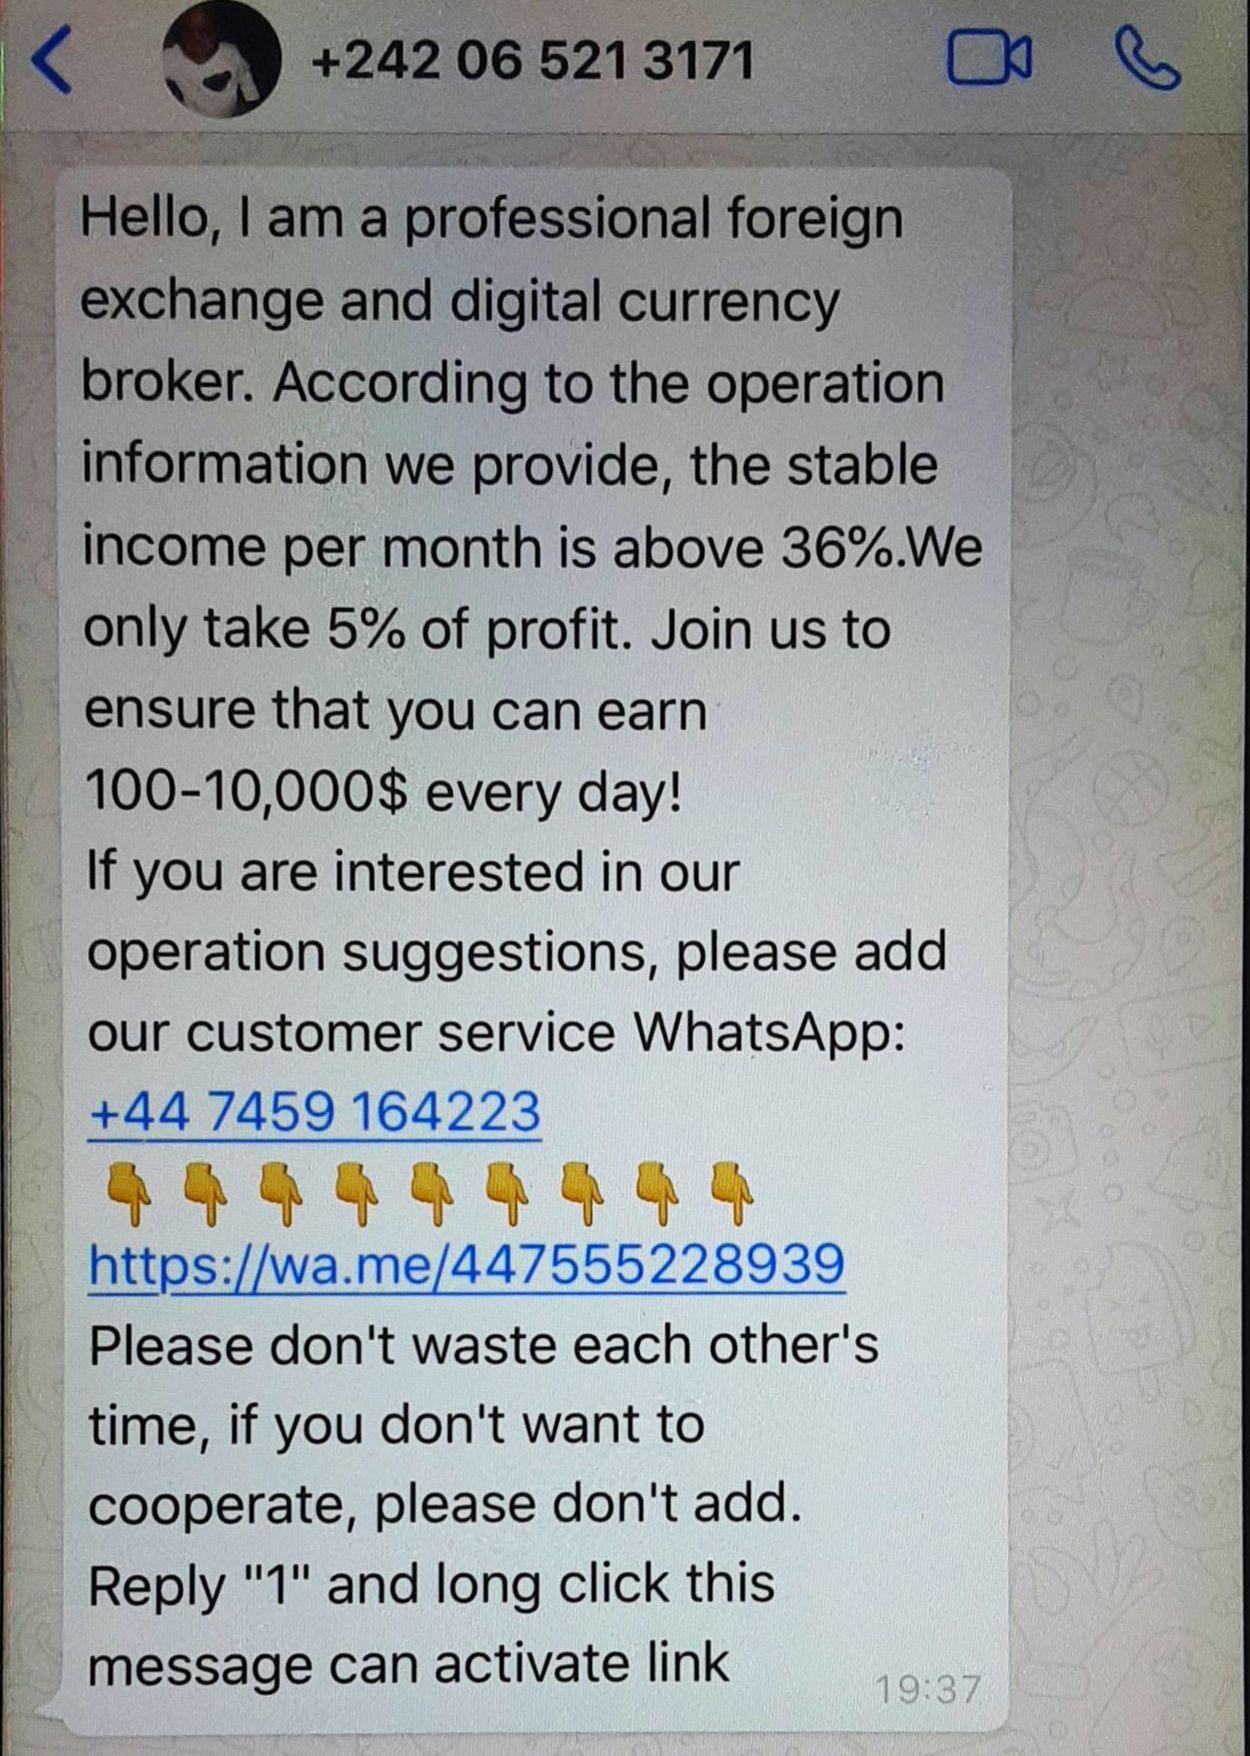 phishing sms april 2021